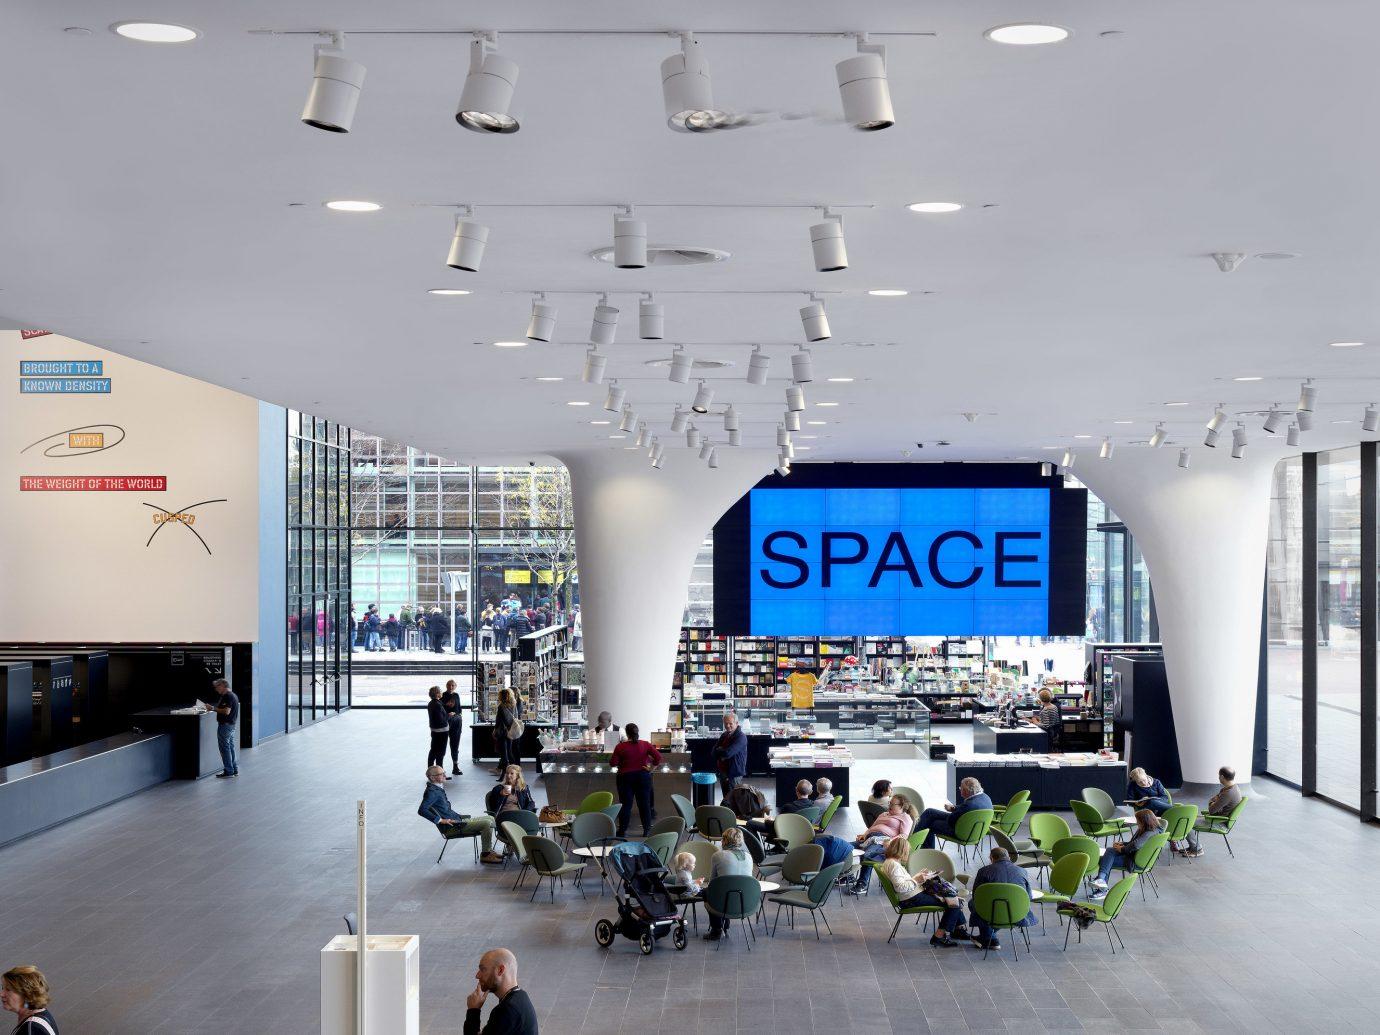 Stedelijk Museum of Modern Art in Amsterdam